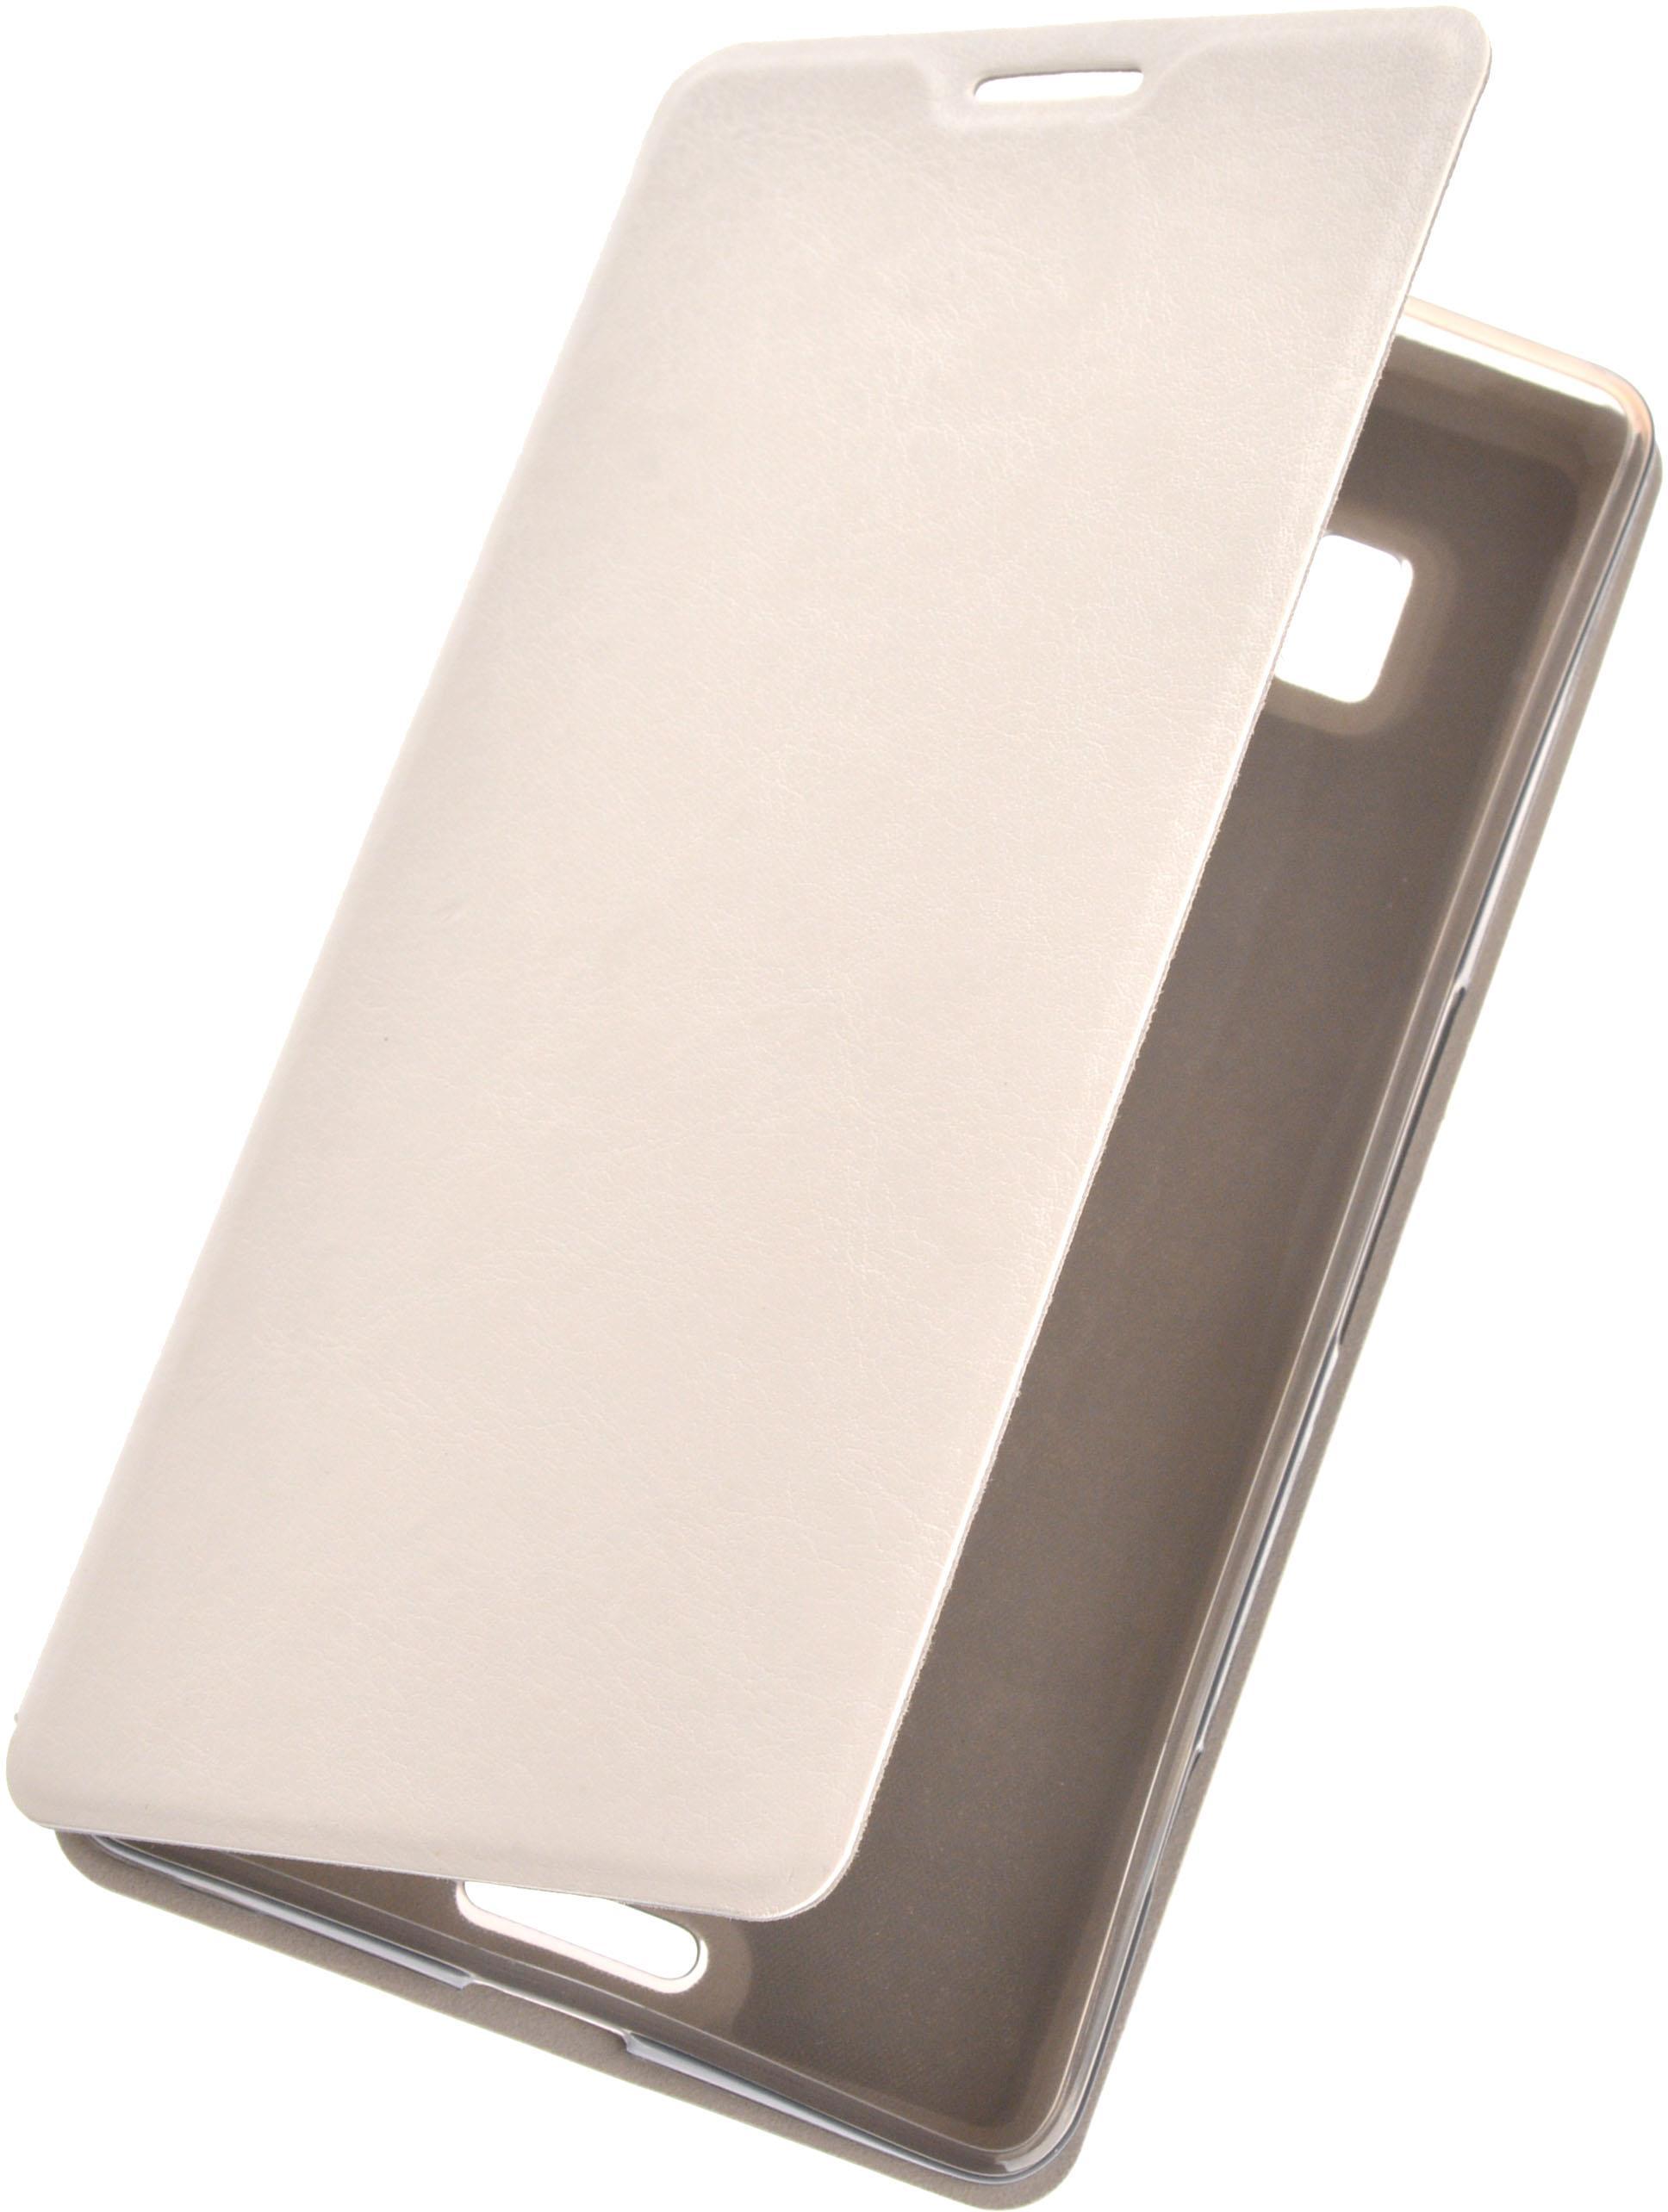 Чехол skinBOX Lux для Microsoft Lumia 950 XL, белый